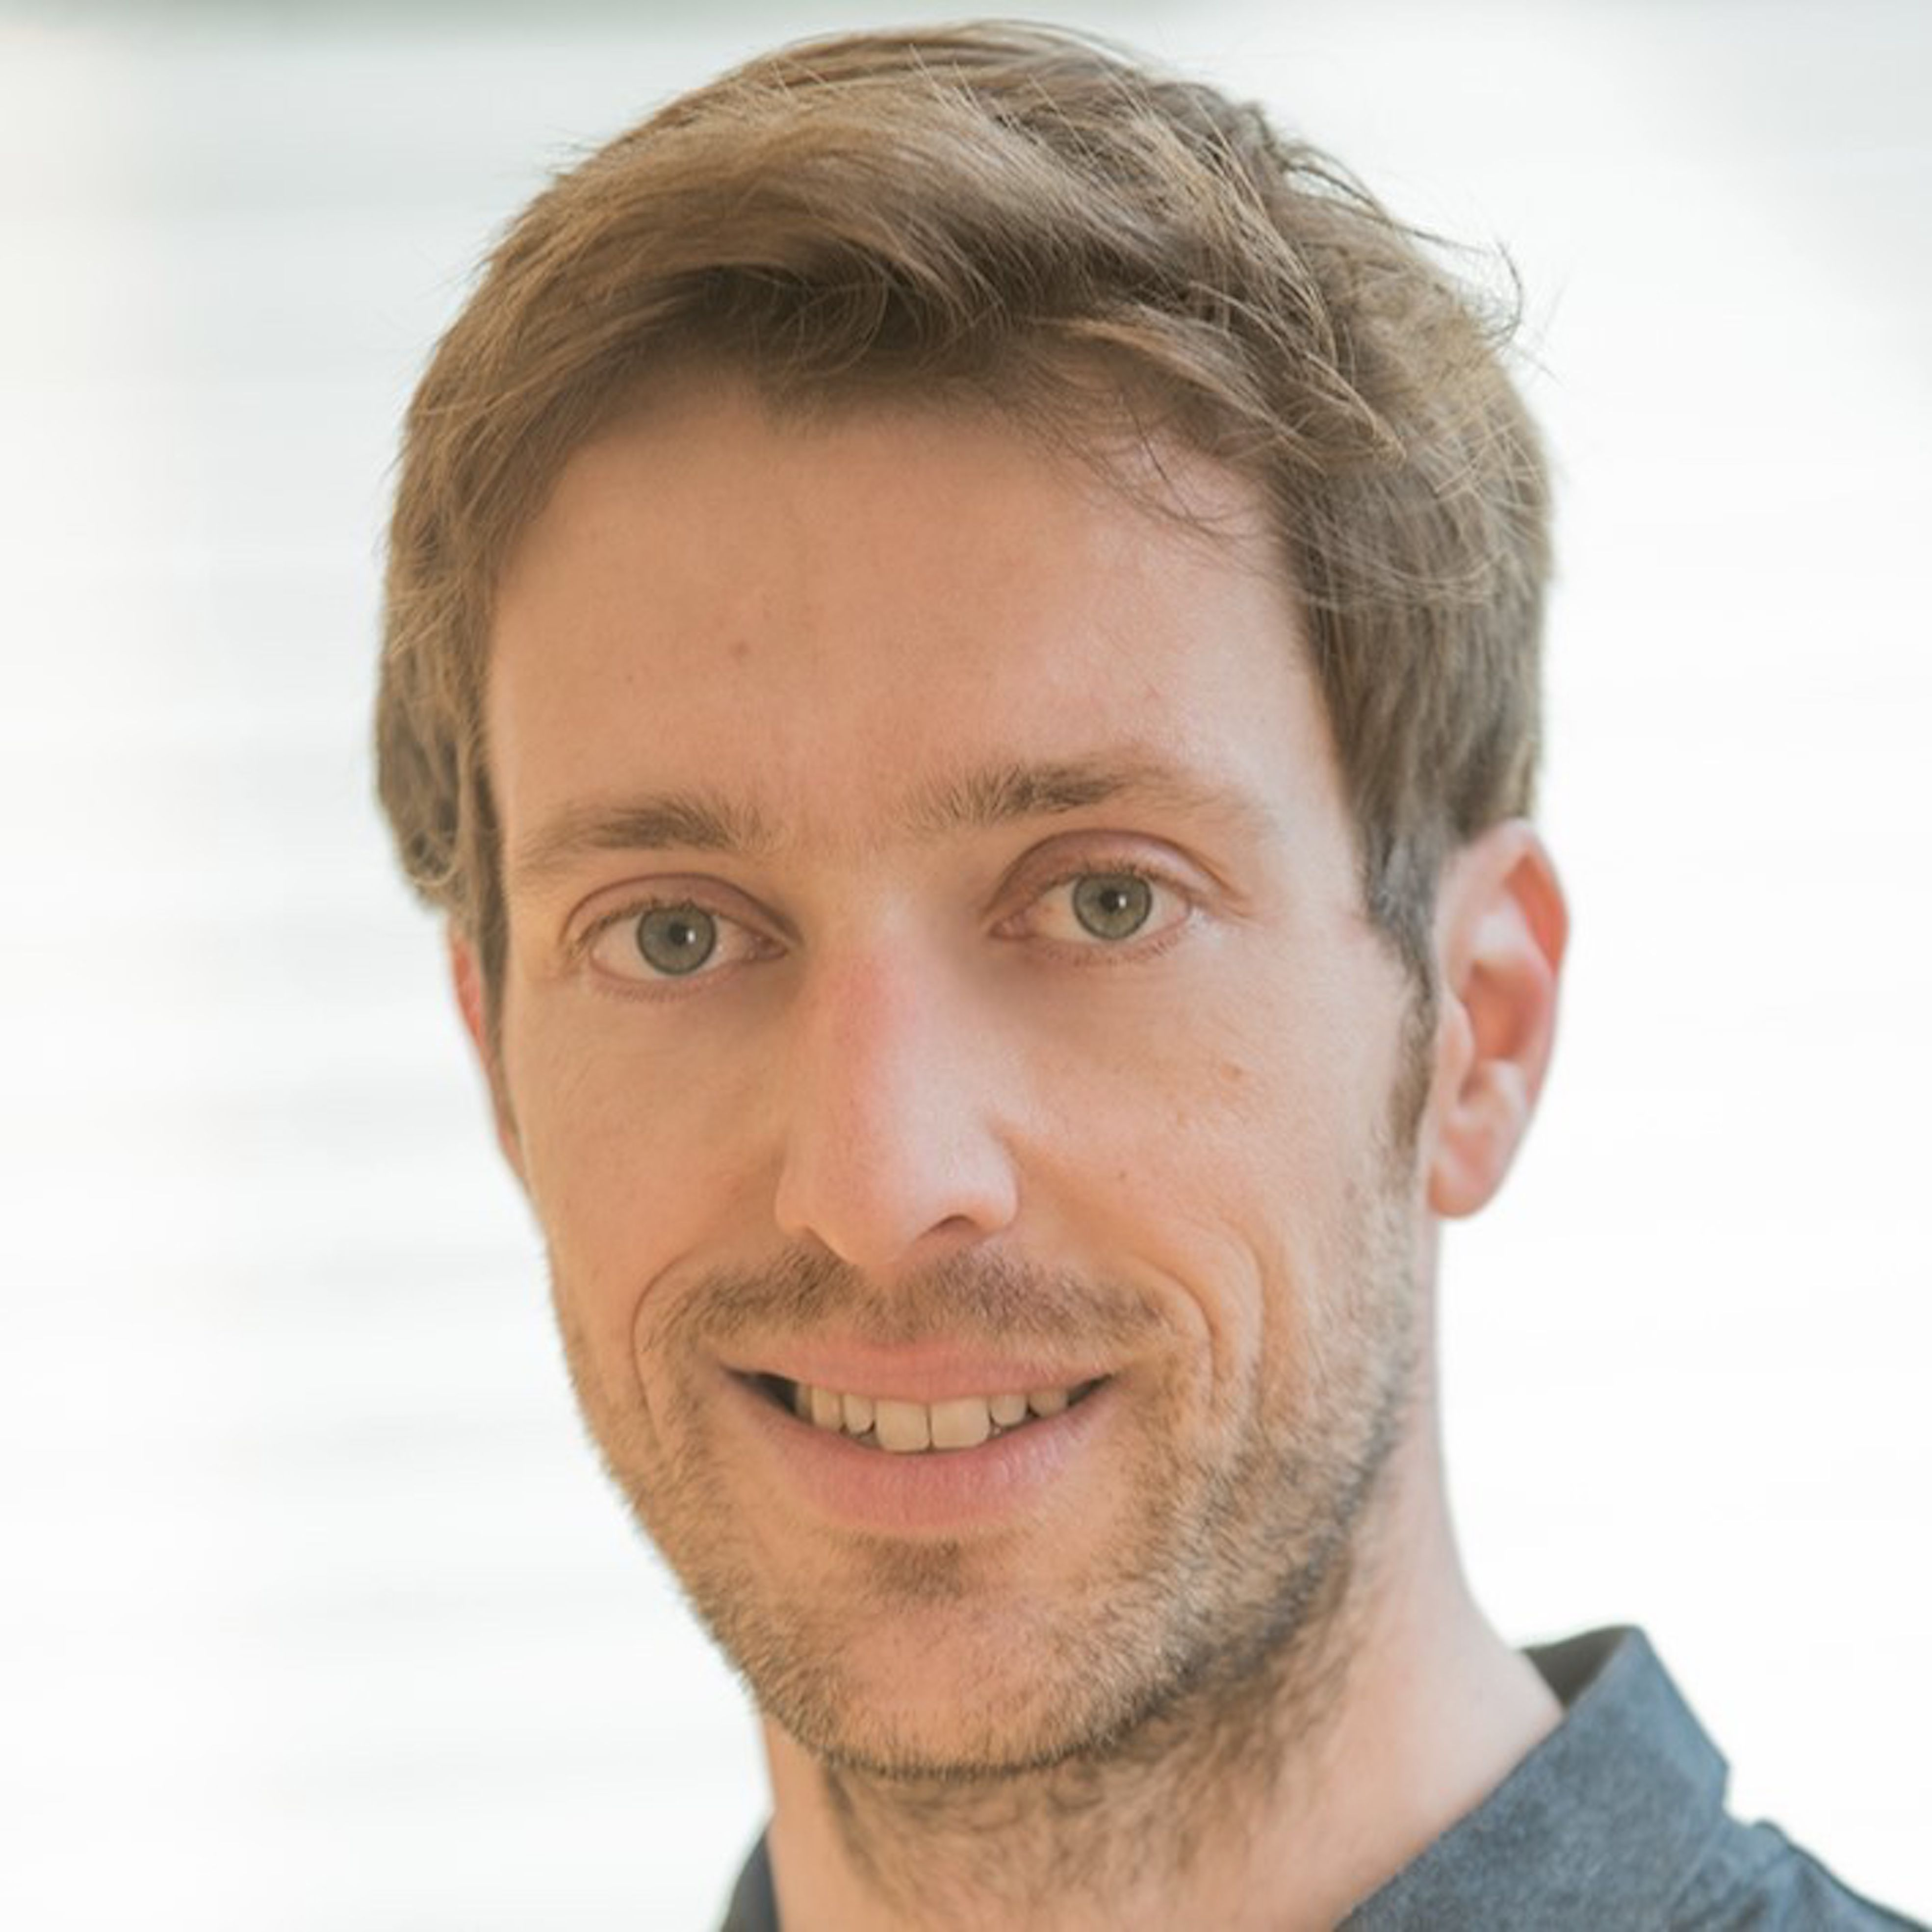 Markus Wettstein